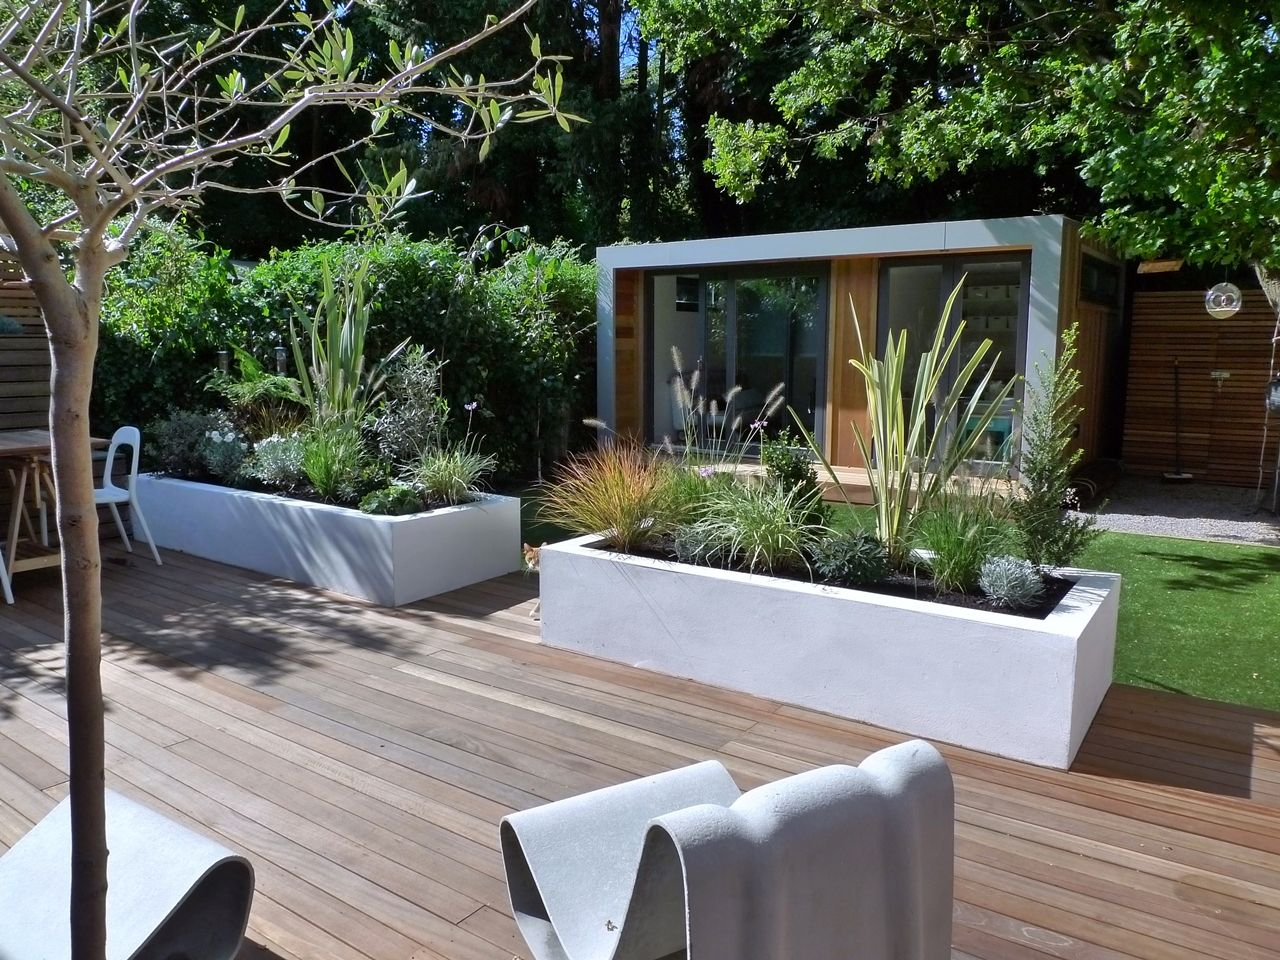 25 Best Ideas About London Garden On Pinterest Small Garden